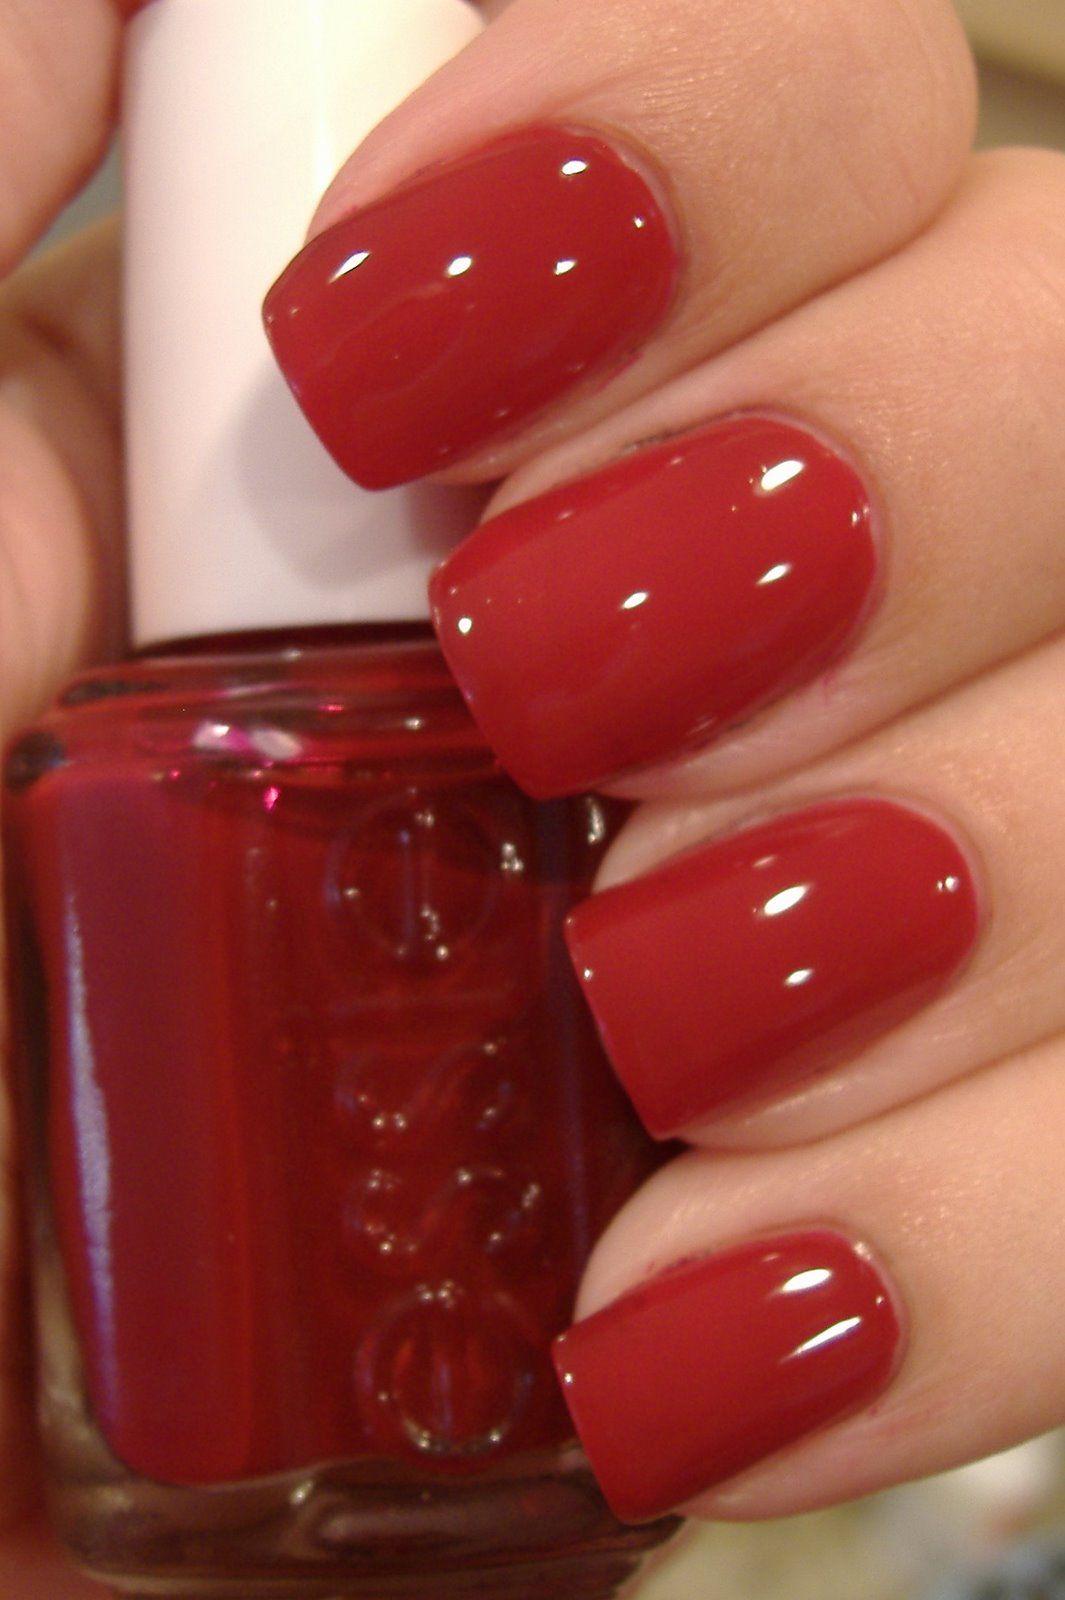 e-polishblog: Essie Pama Nail Polish Giveaway | Nails | Pinterest ...